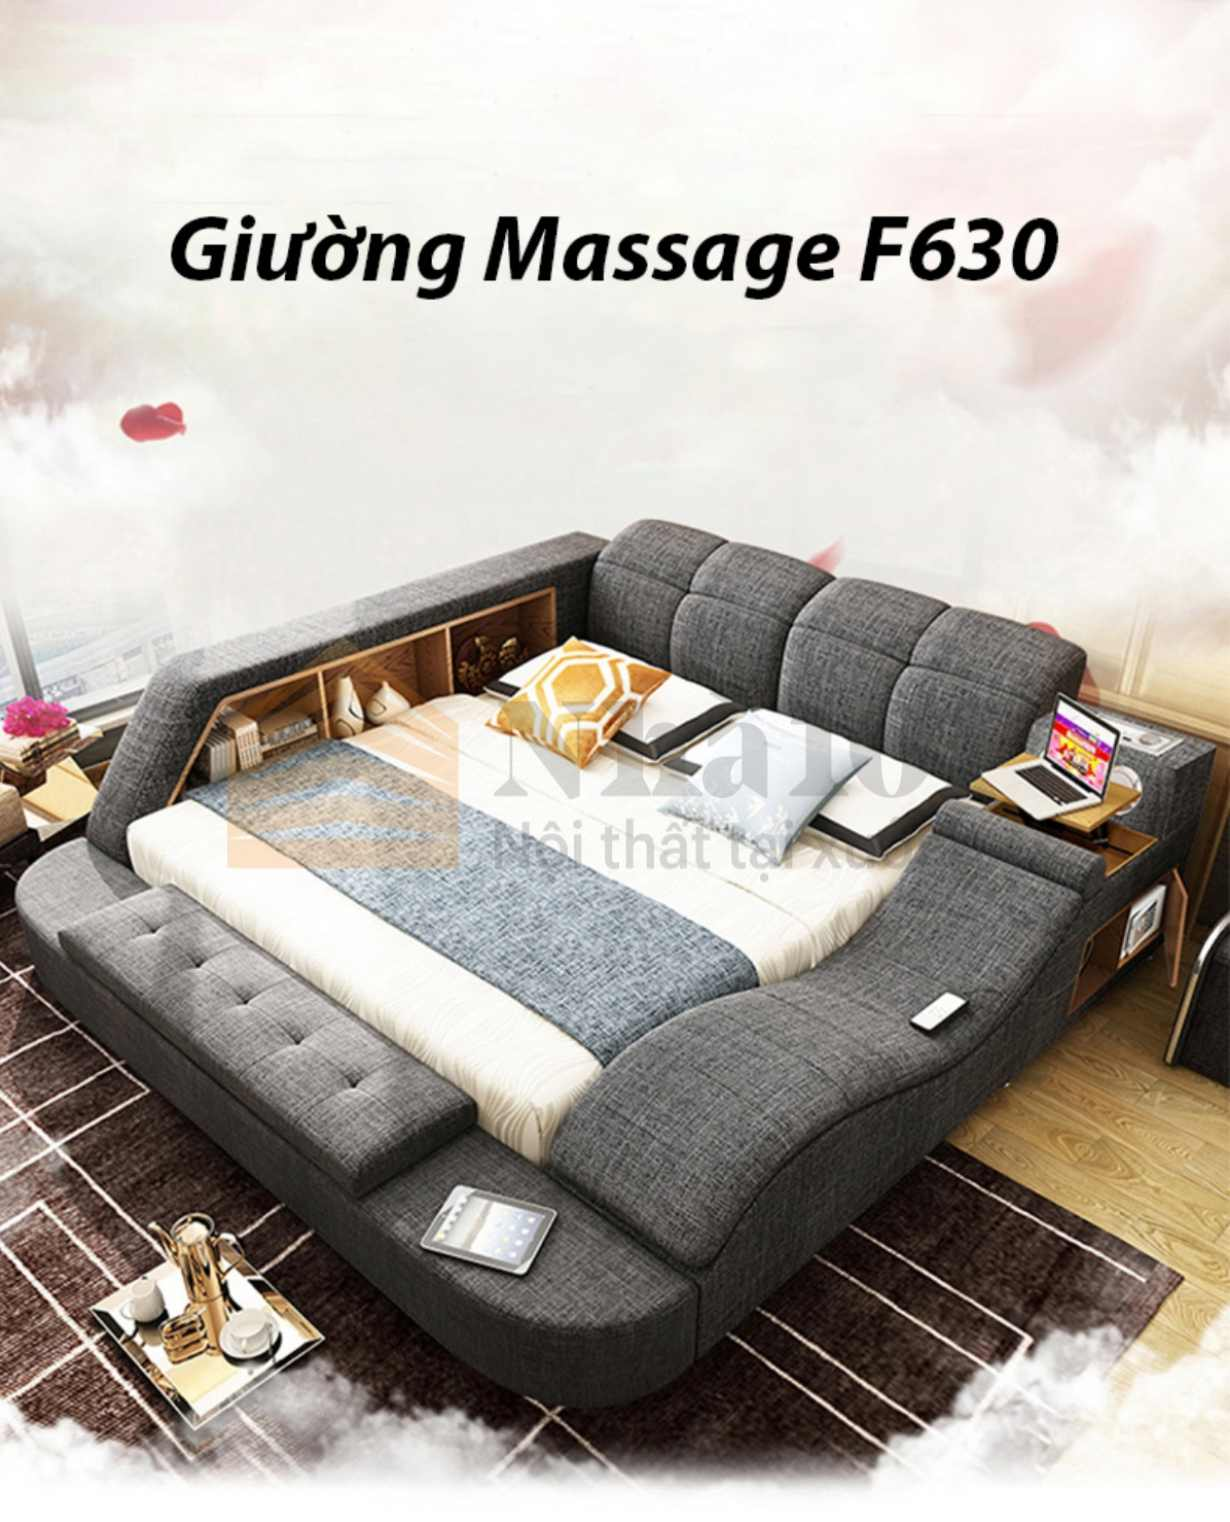 Giường Massage F630, giường massage, giường massage tiện nghi 1